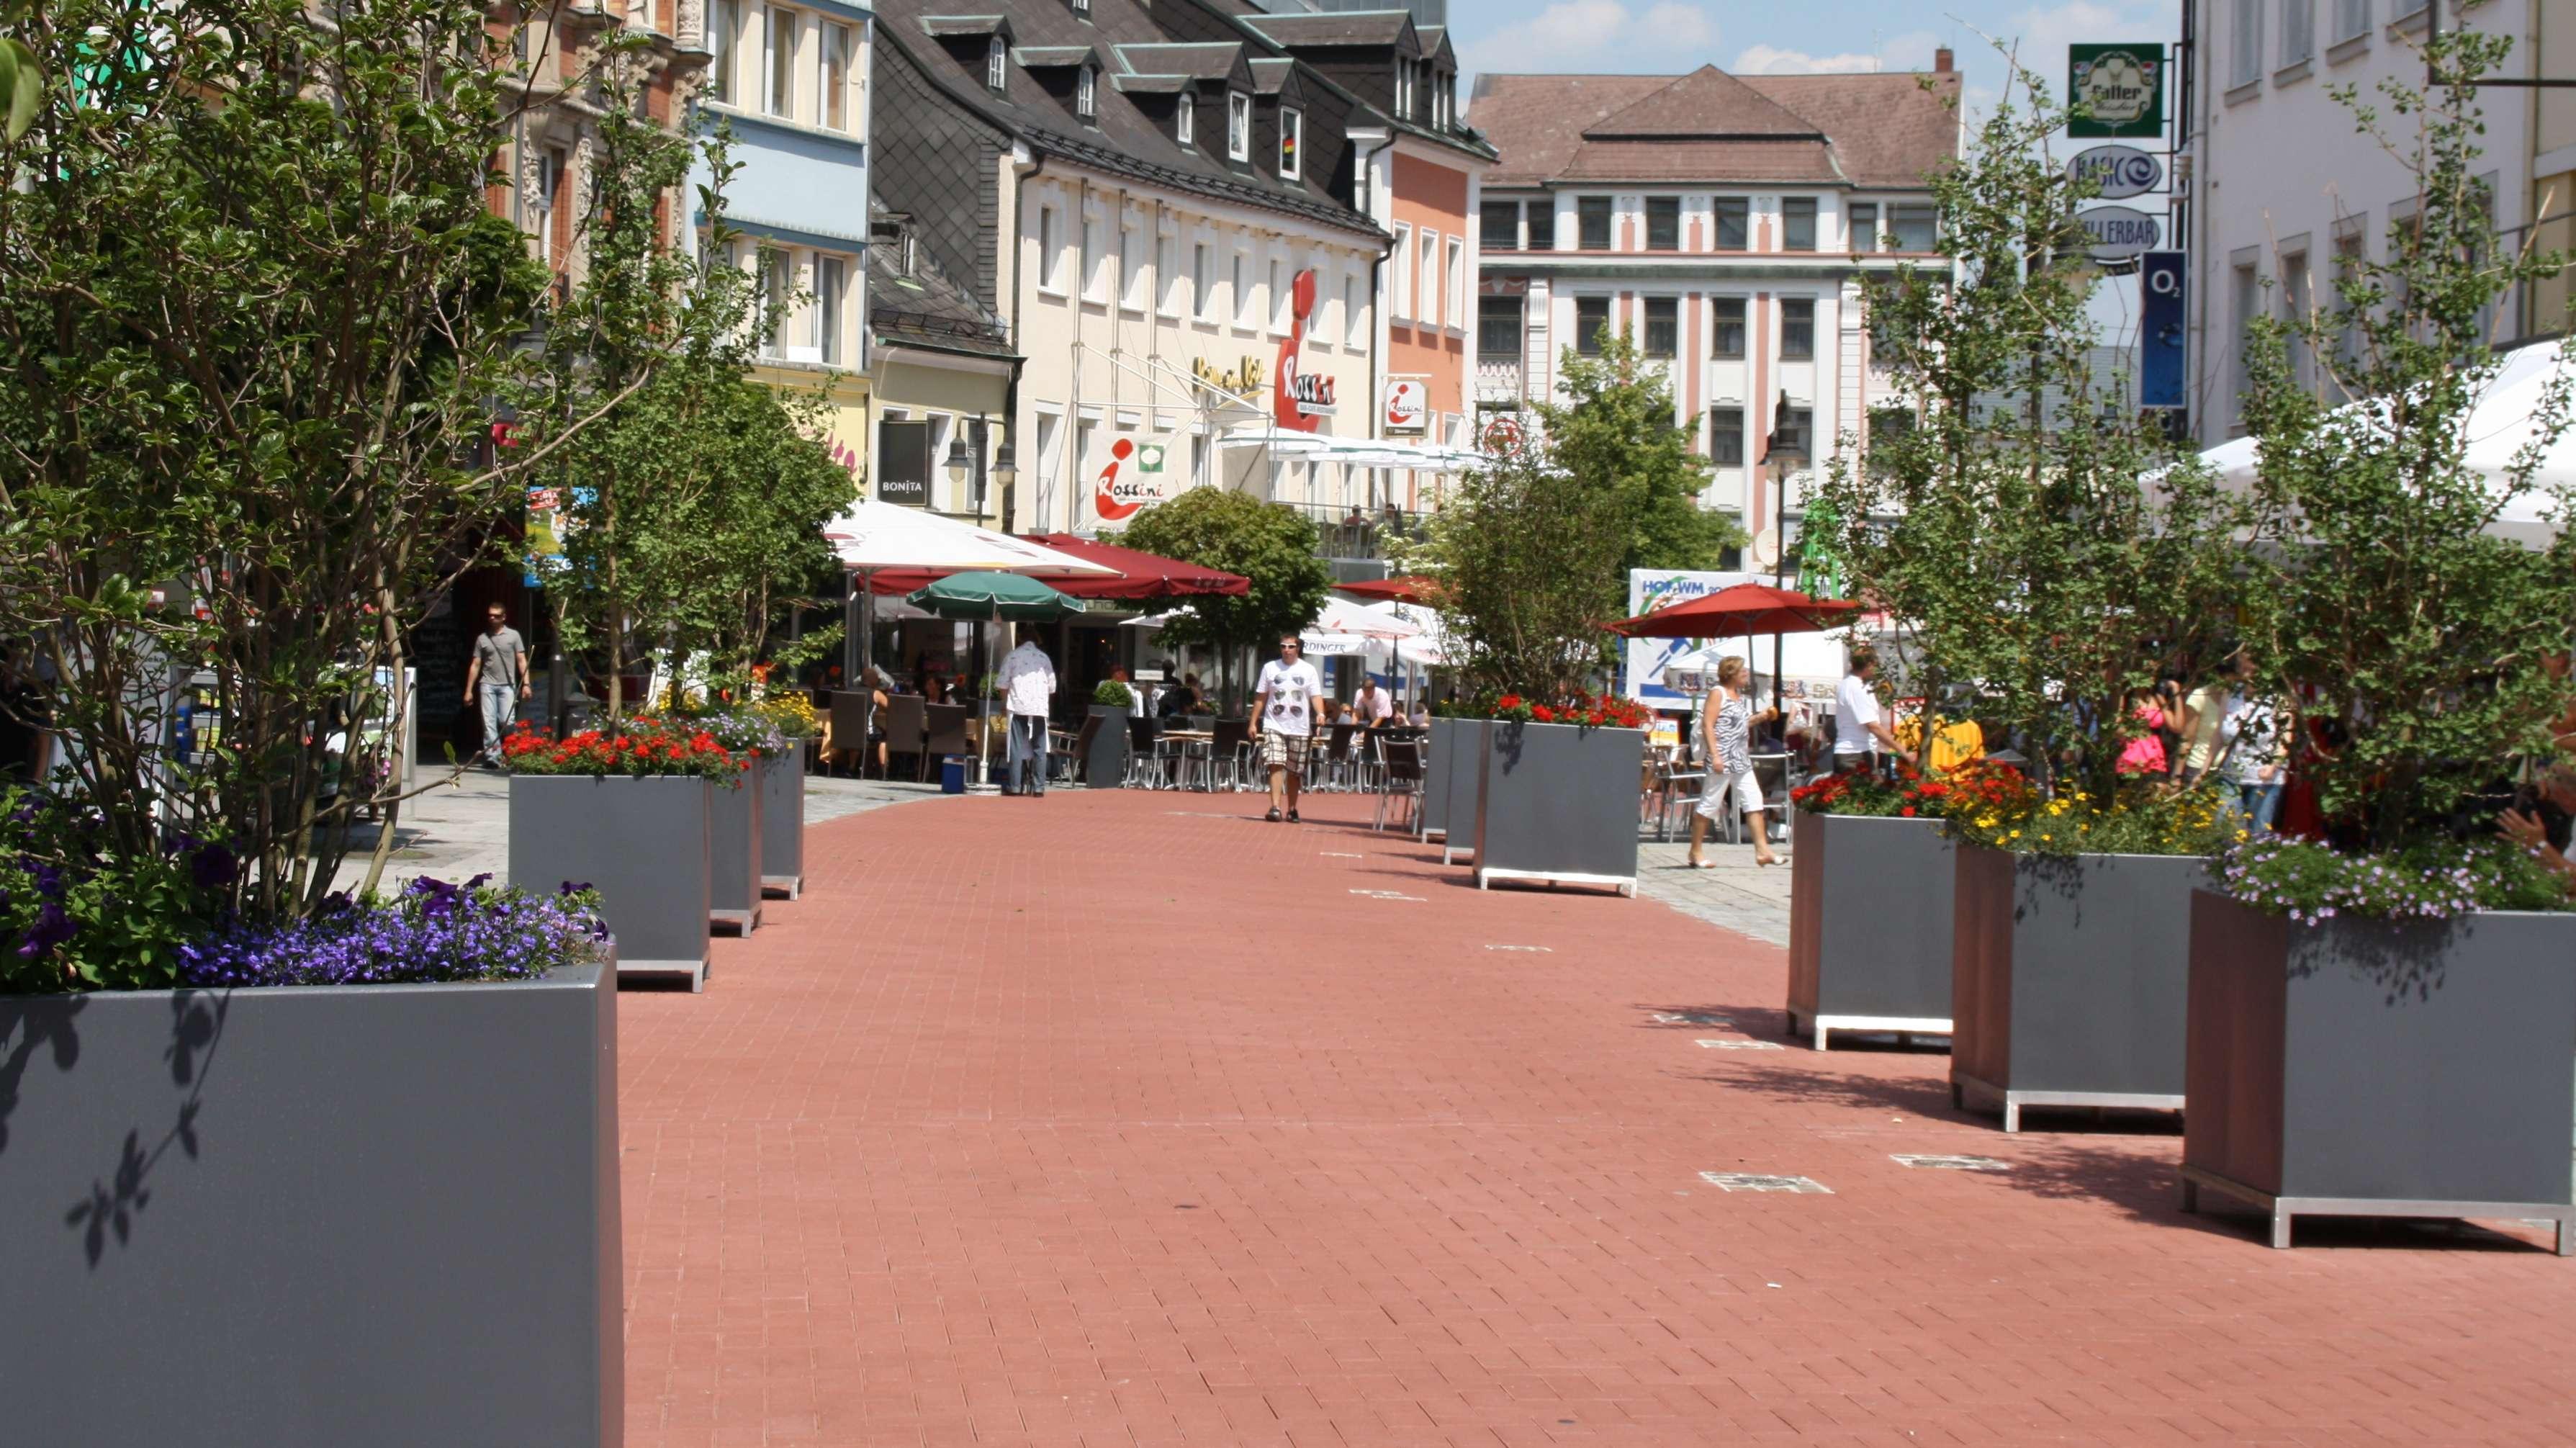 Blick in die Hofer Fußgängerzone